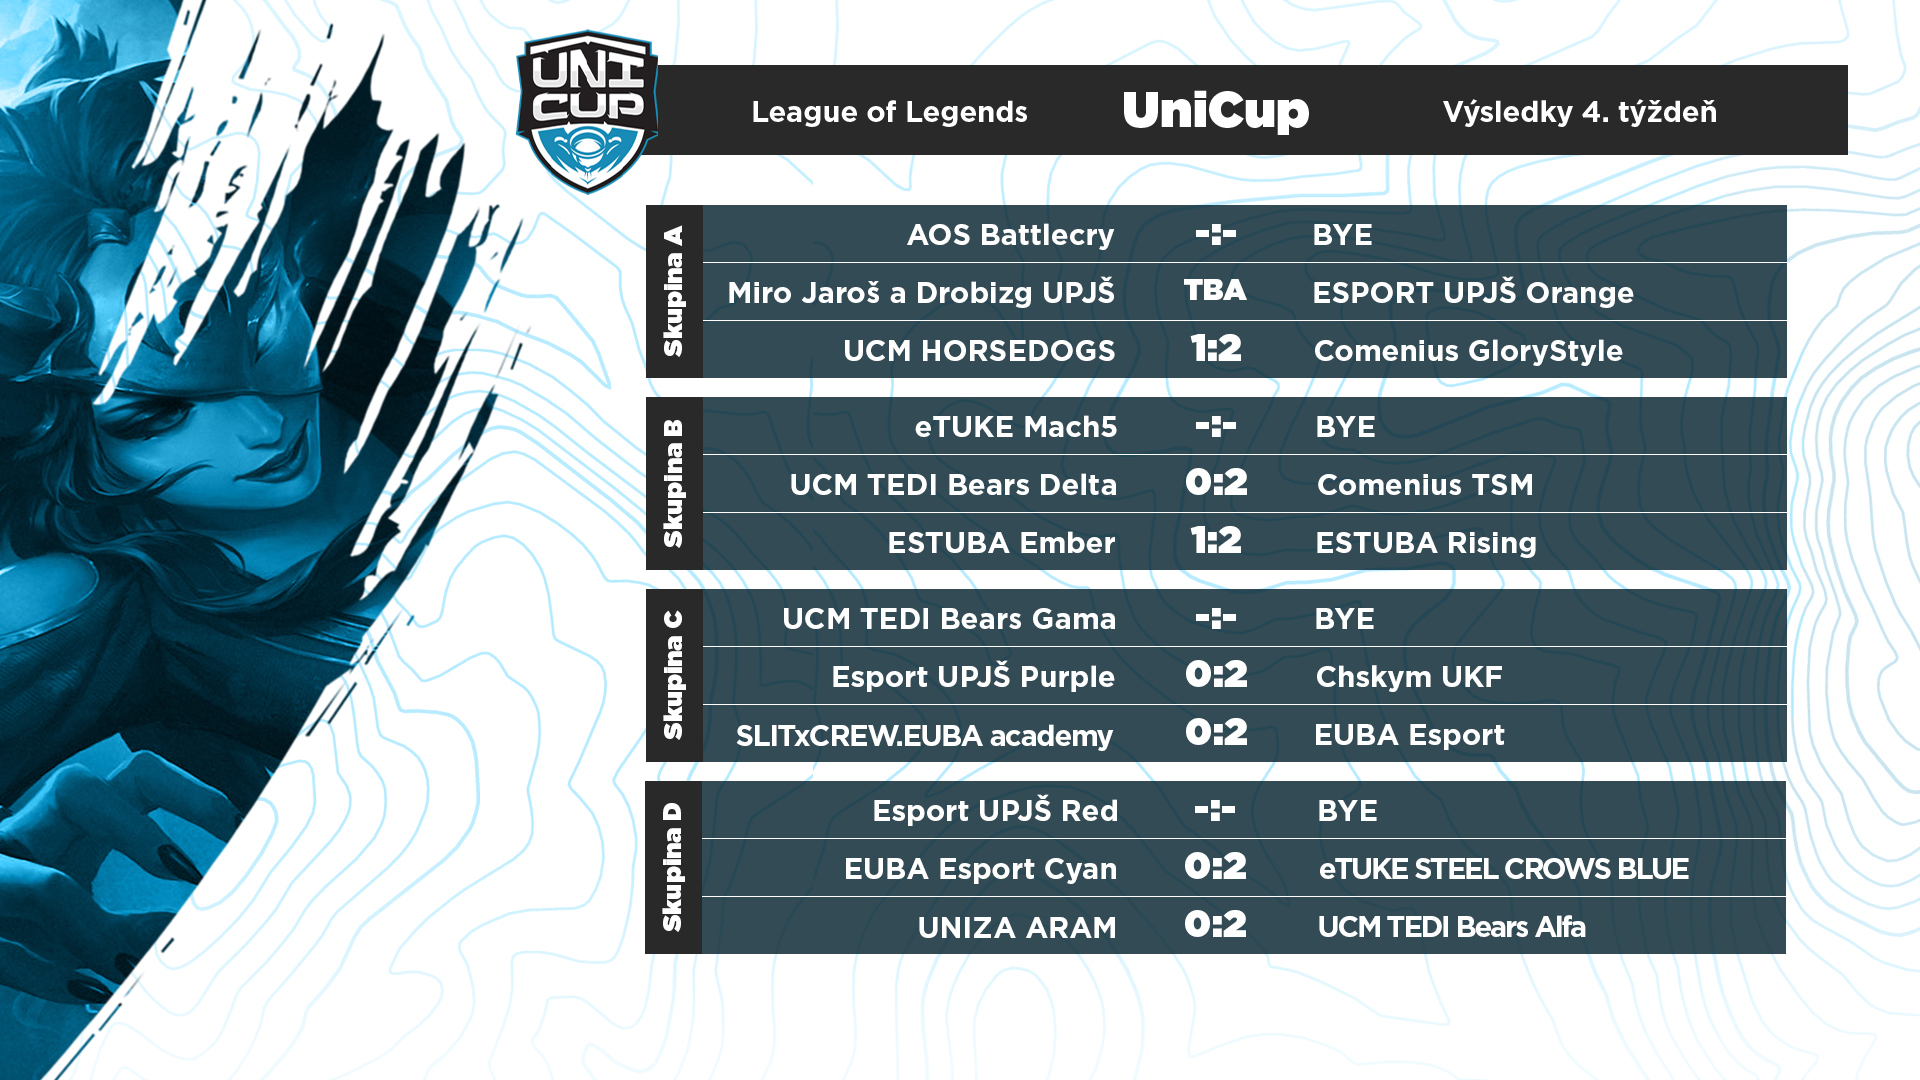 Výsledky zápasov vLoL skupín A až D.